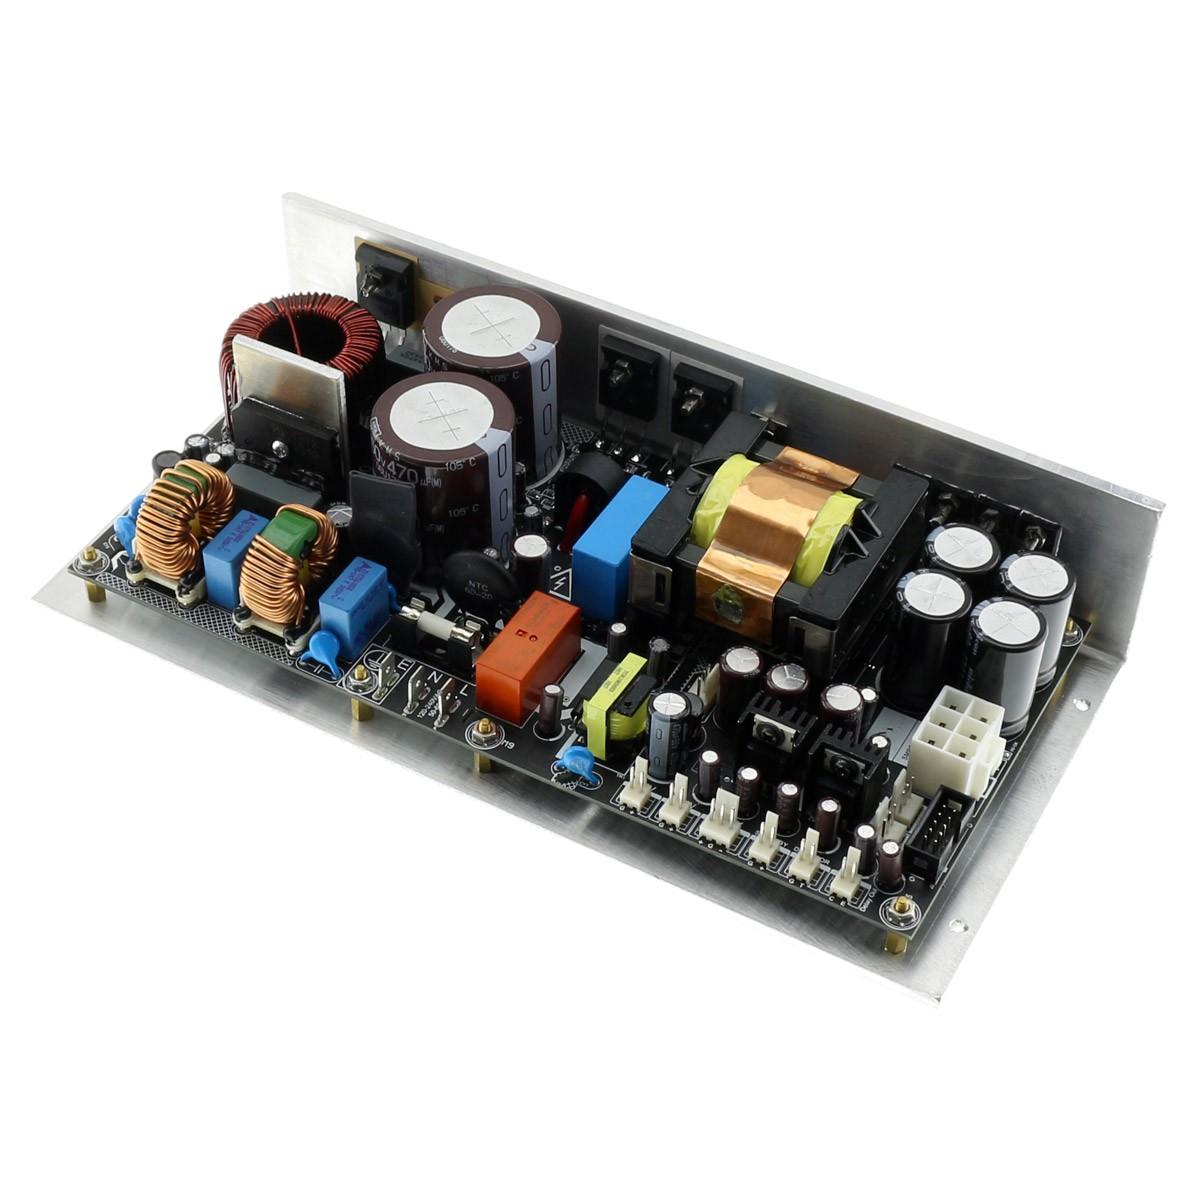 MICRO AUDIO SMPS1K-PFC Module d'Alimentation à Découpage 2x64V 12V 3.3V +/-18V +/-25V 1500W